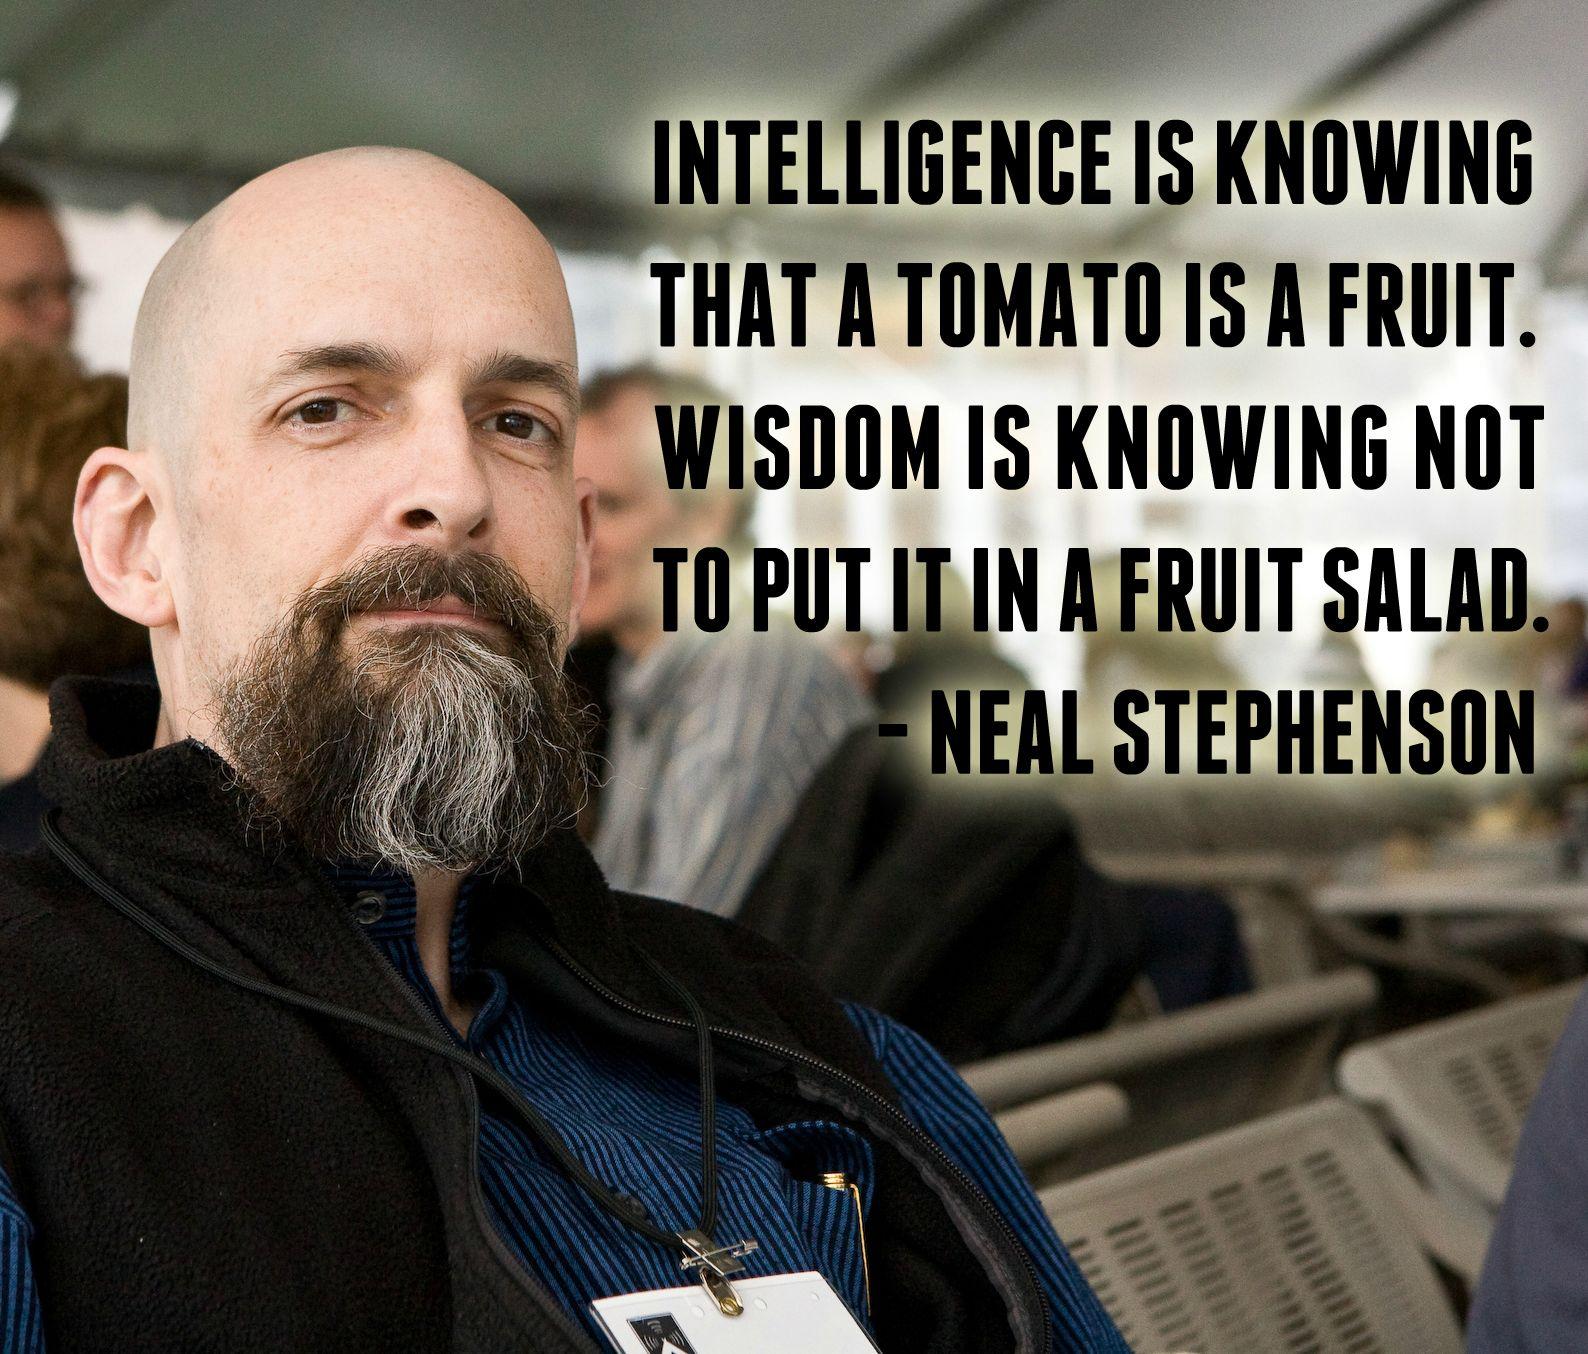 Neal Stephenson's quote #2